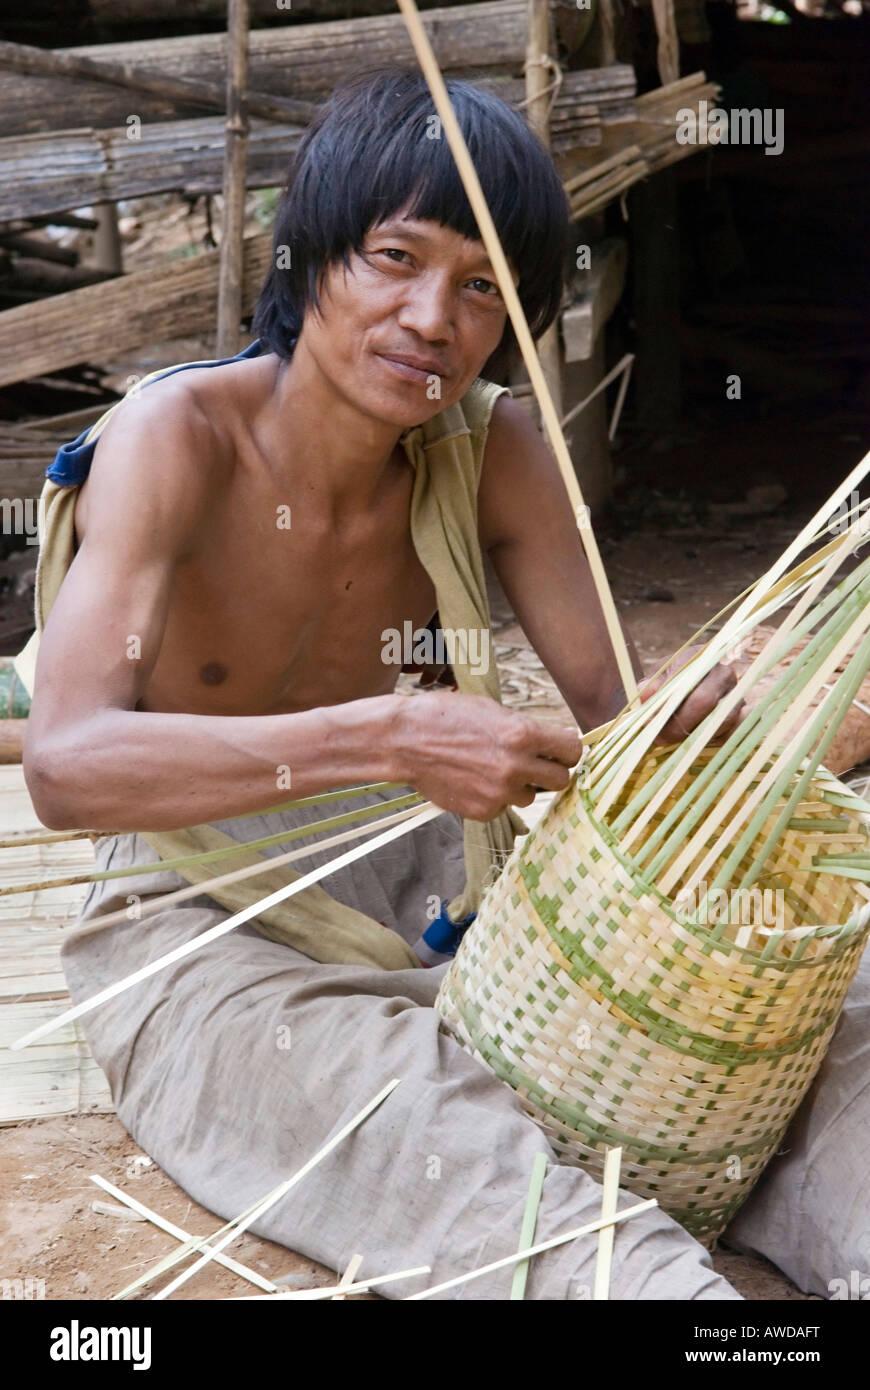 Basket waver, IDP-Camp Ei Tu Hta, IDP-Area bordering Thailand near Mae Sariang, Birma - Stock Image